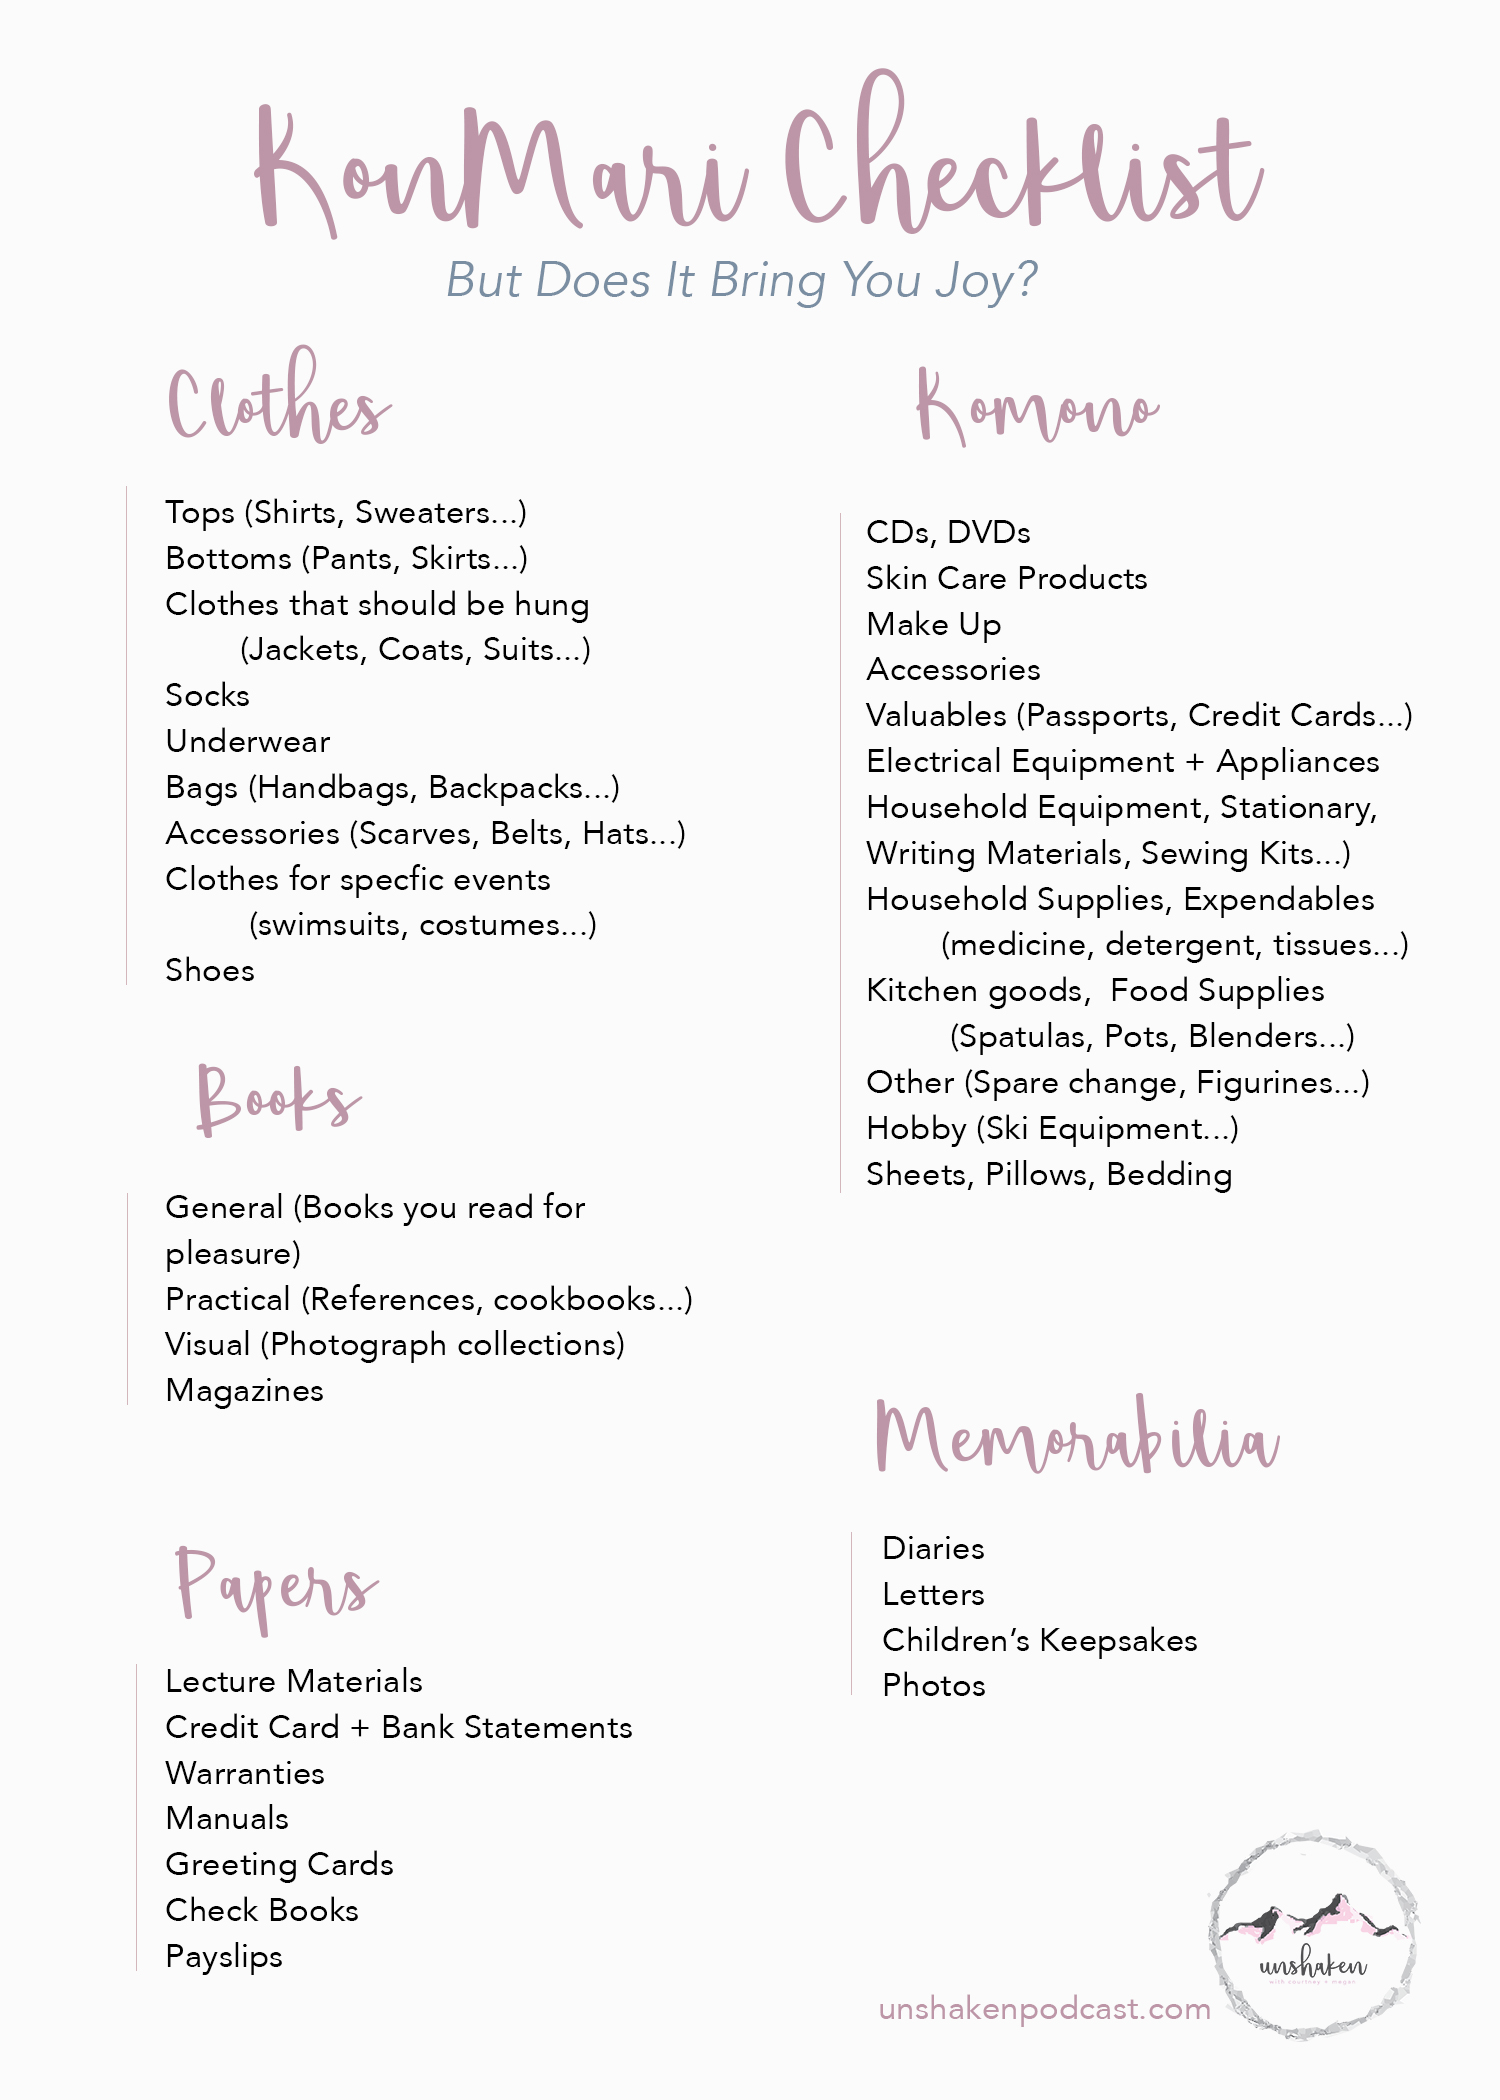 KonMari Checklist.jpg